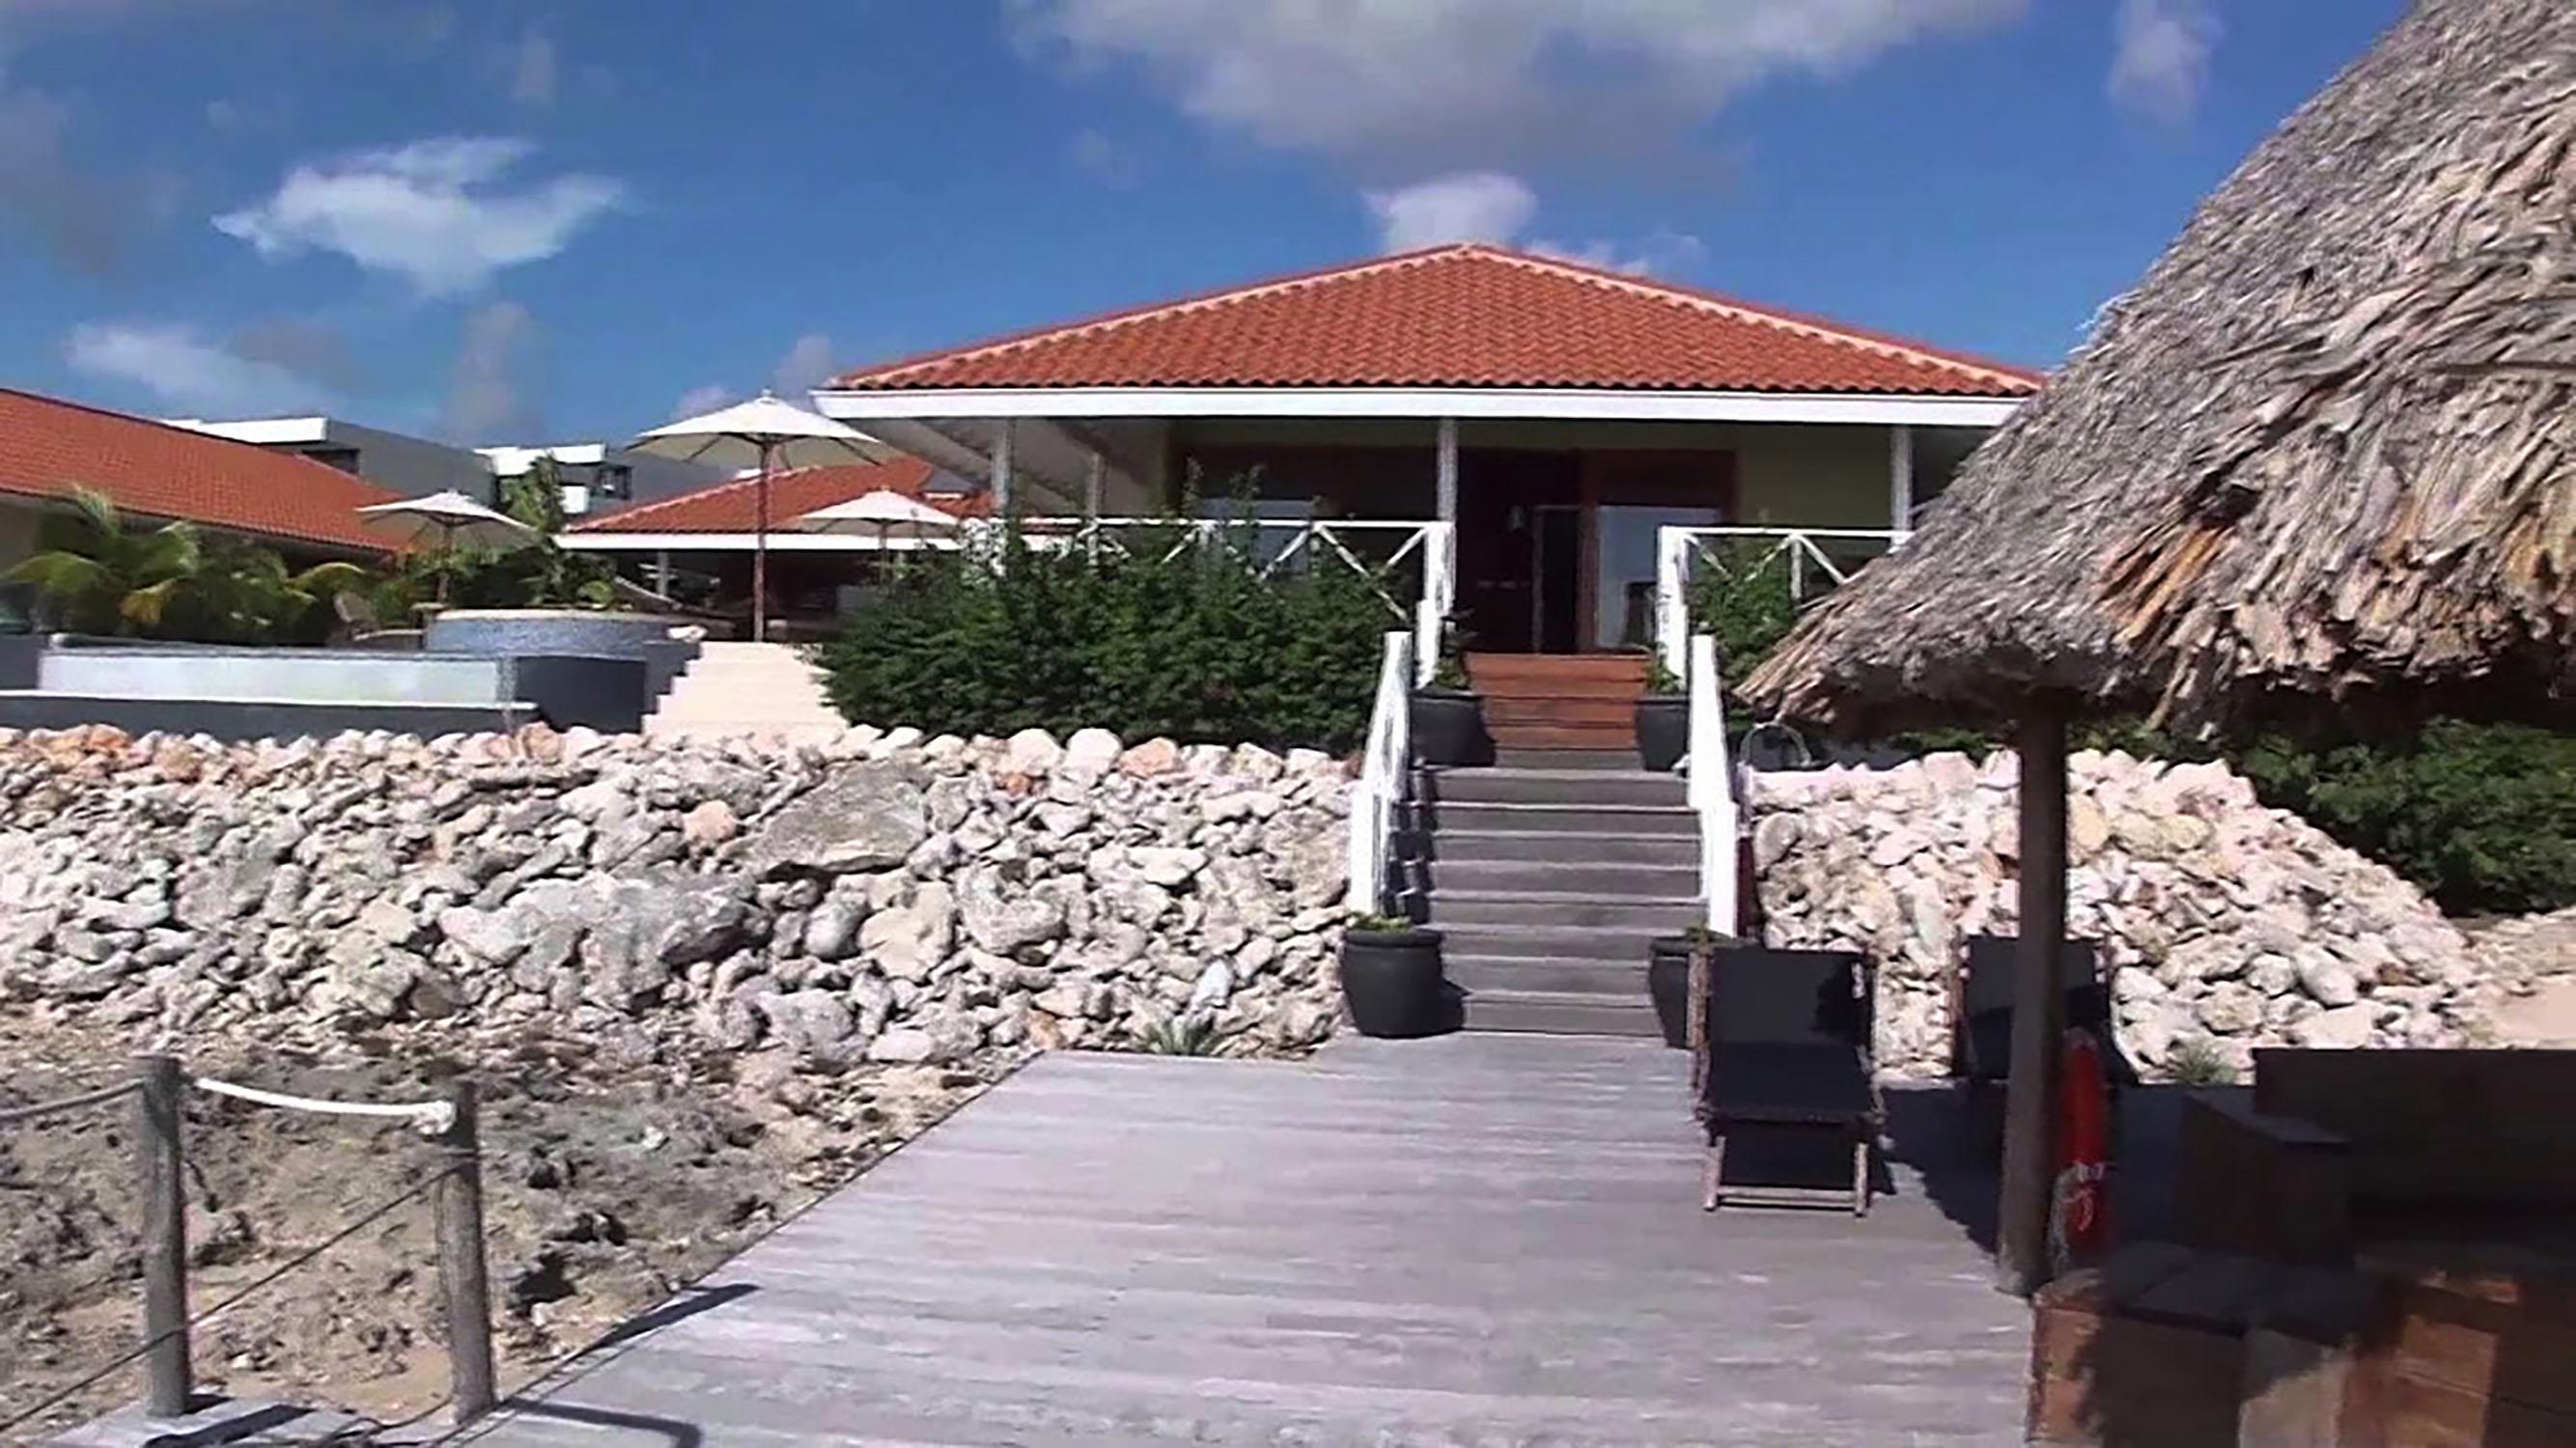 http://www.villaseaparadisecuracao.nl/wp-content/uploads/2019/02/beachvilla1500.jpg